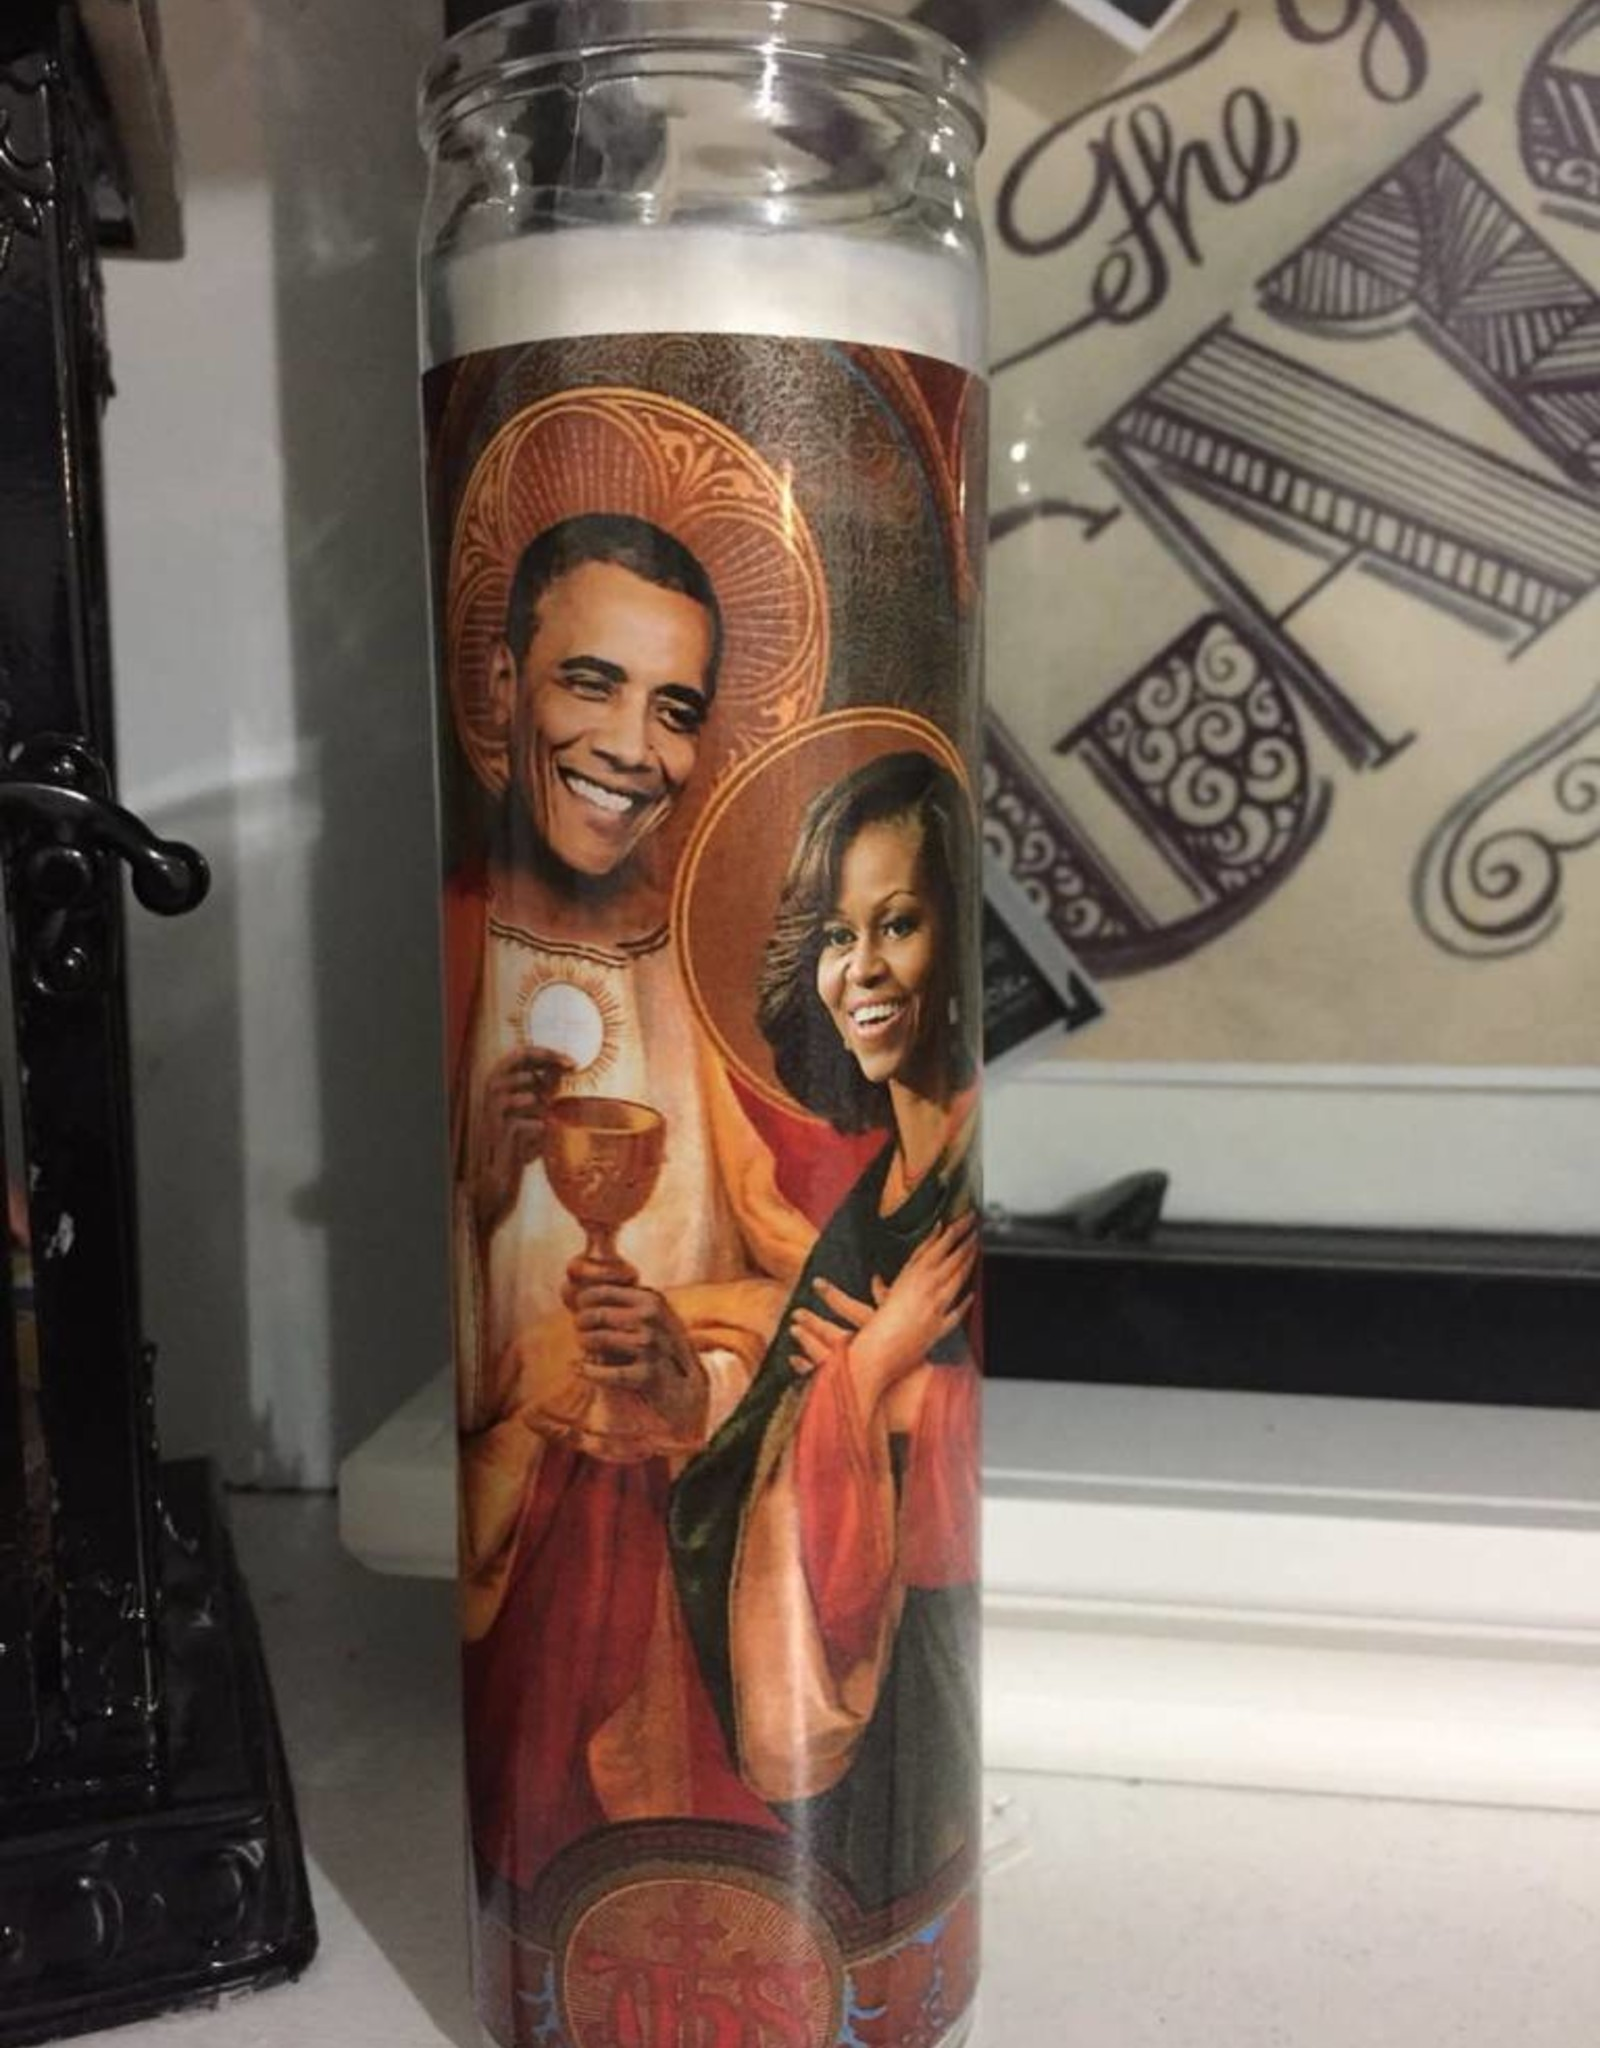 Rust Belt Cooperative Michelle & Barack Obama Prayer Candle